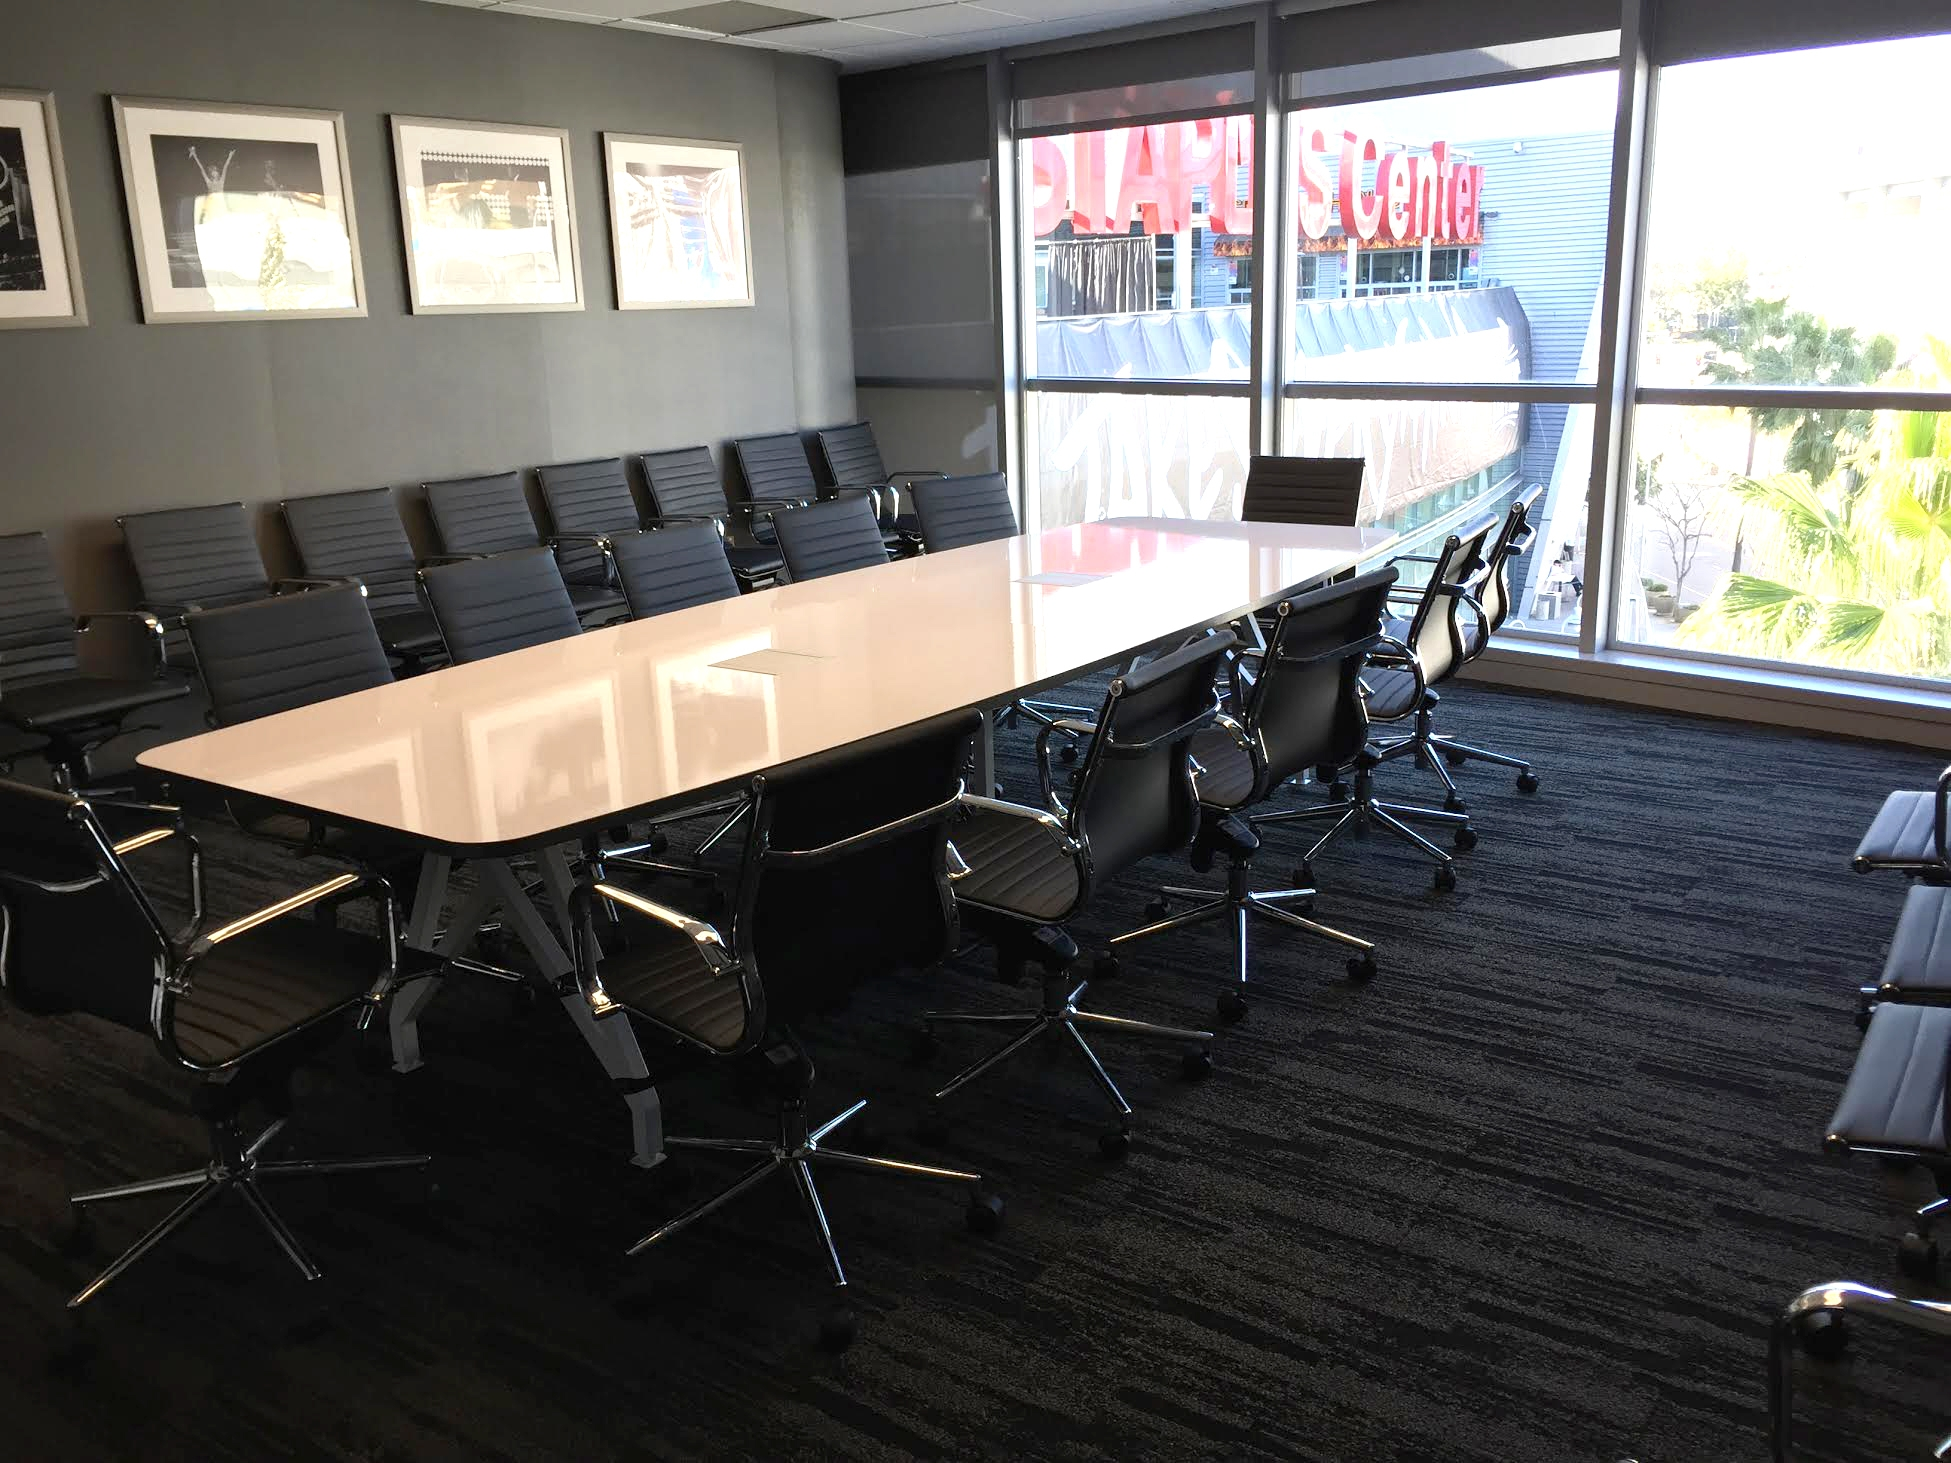 AEG Boardroom Kayak Conference Table